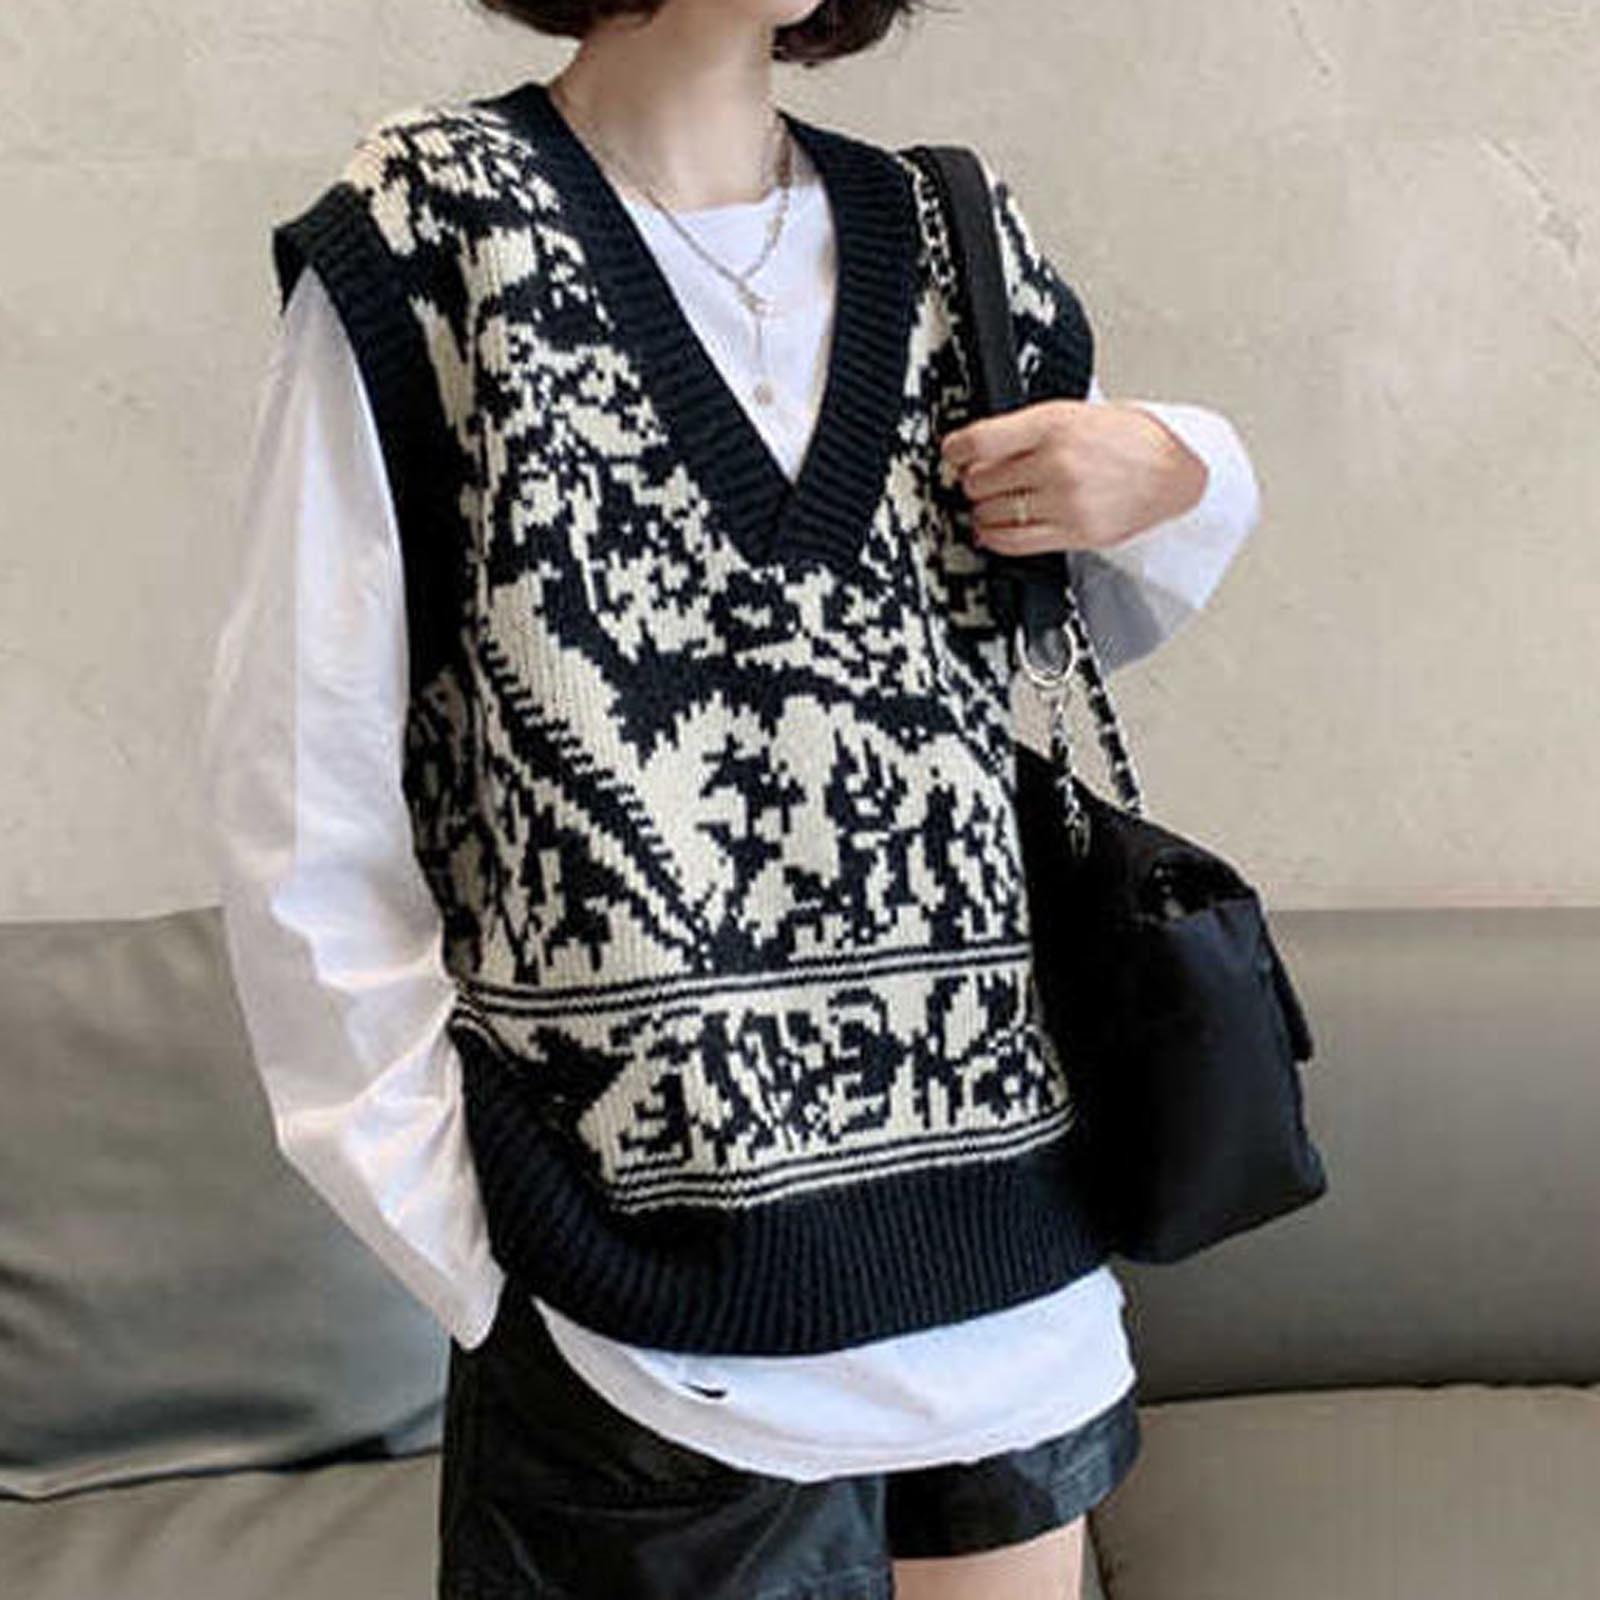 Knitted Sweater Vest Women's Knitted Printed Long Sleeve Sweaters Oversized PK K618 ullover V-neck Ladies Sleeveless Vest Top